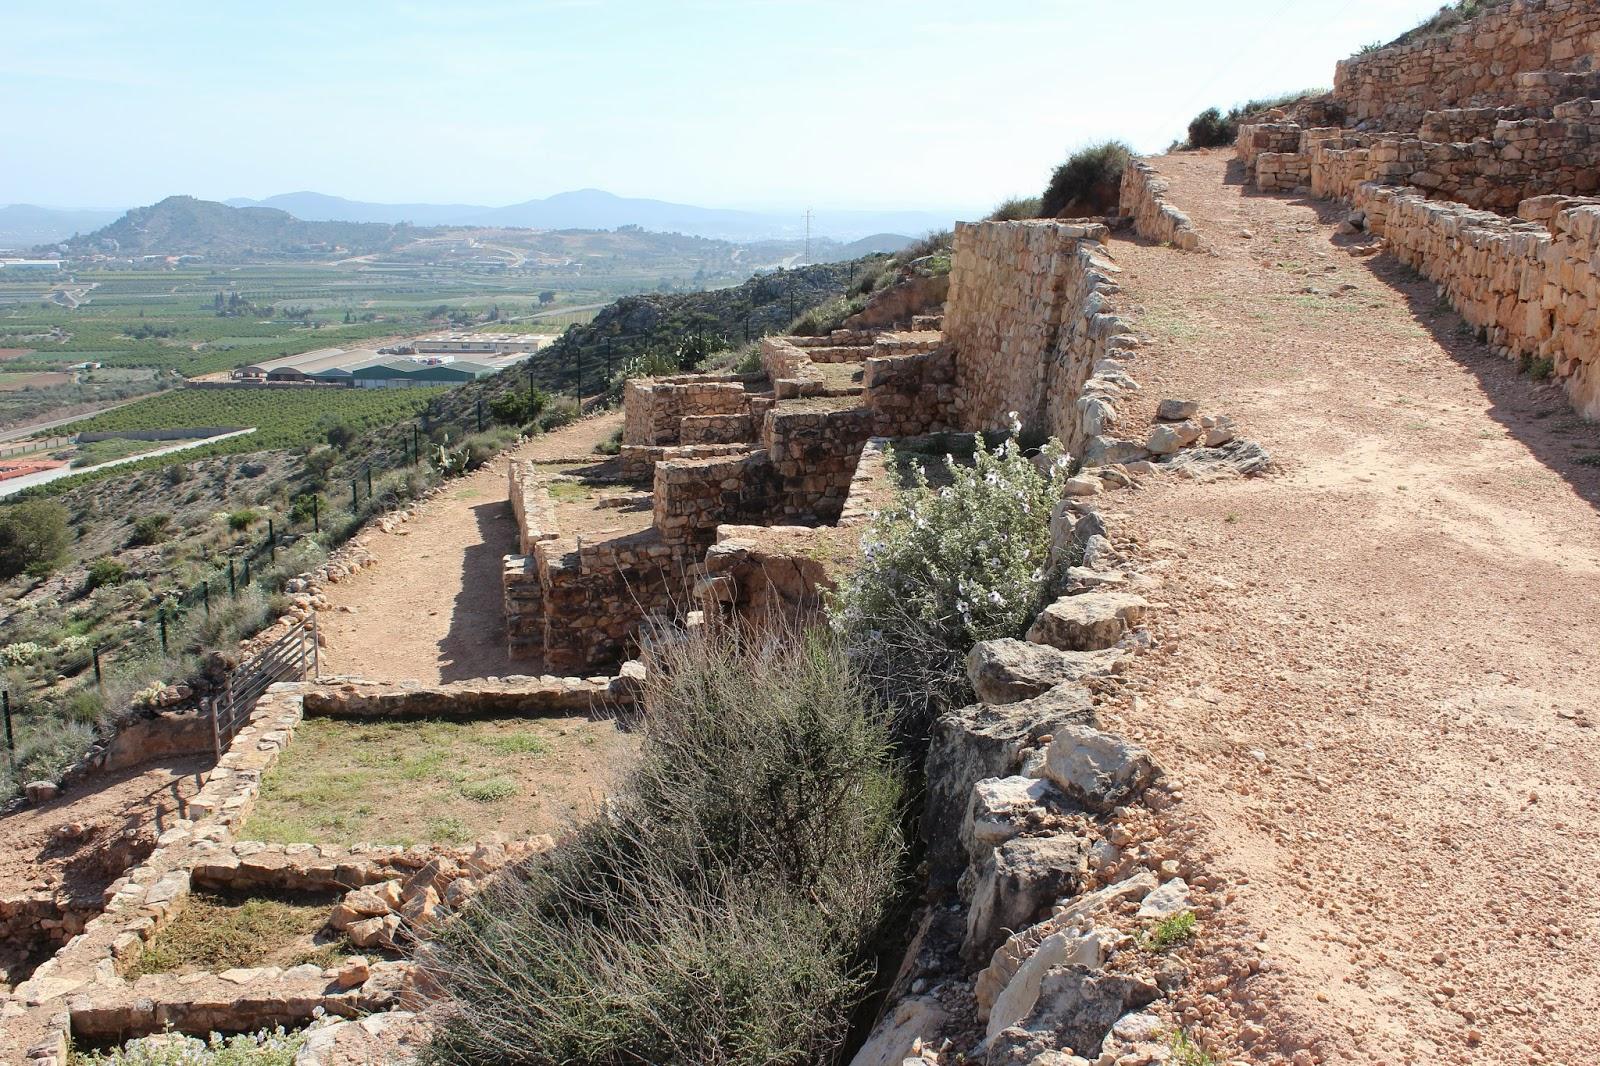 Yacimiento de Edeta en Liria (Valencia)